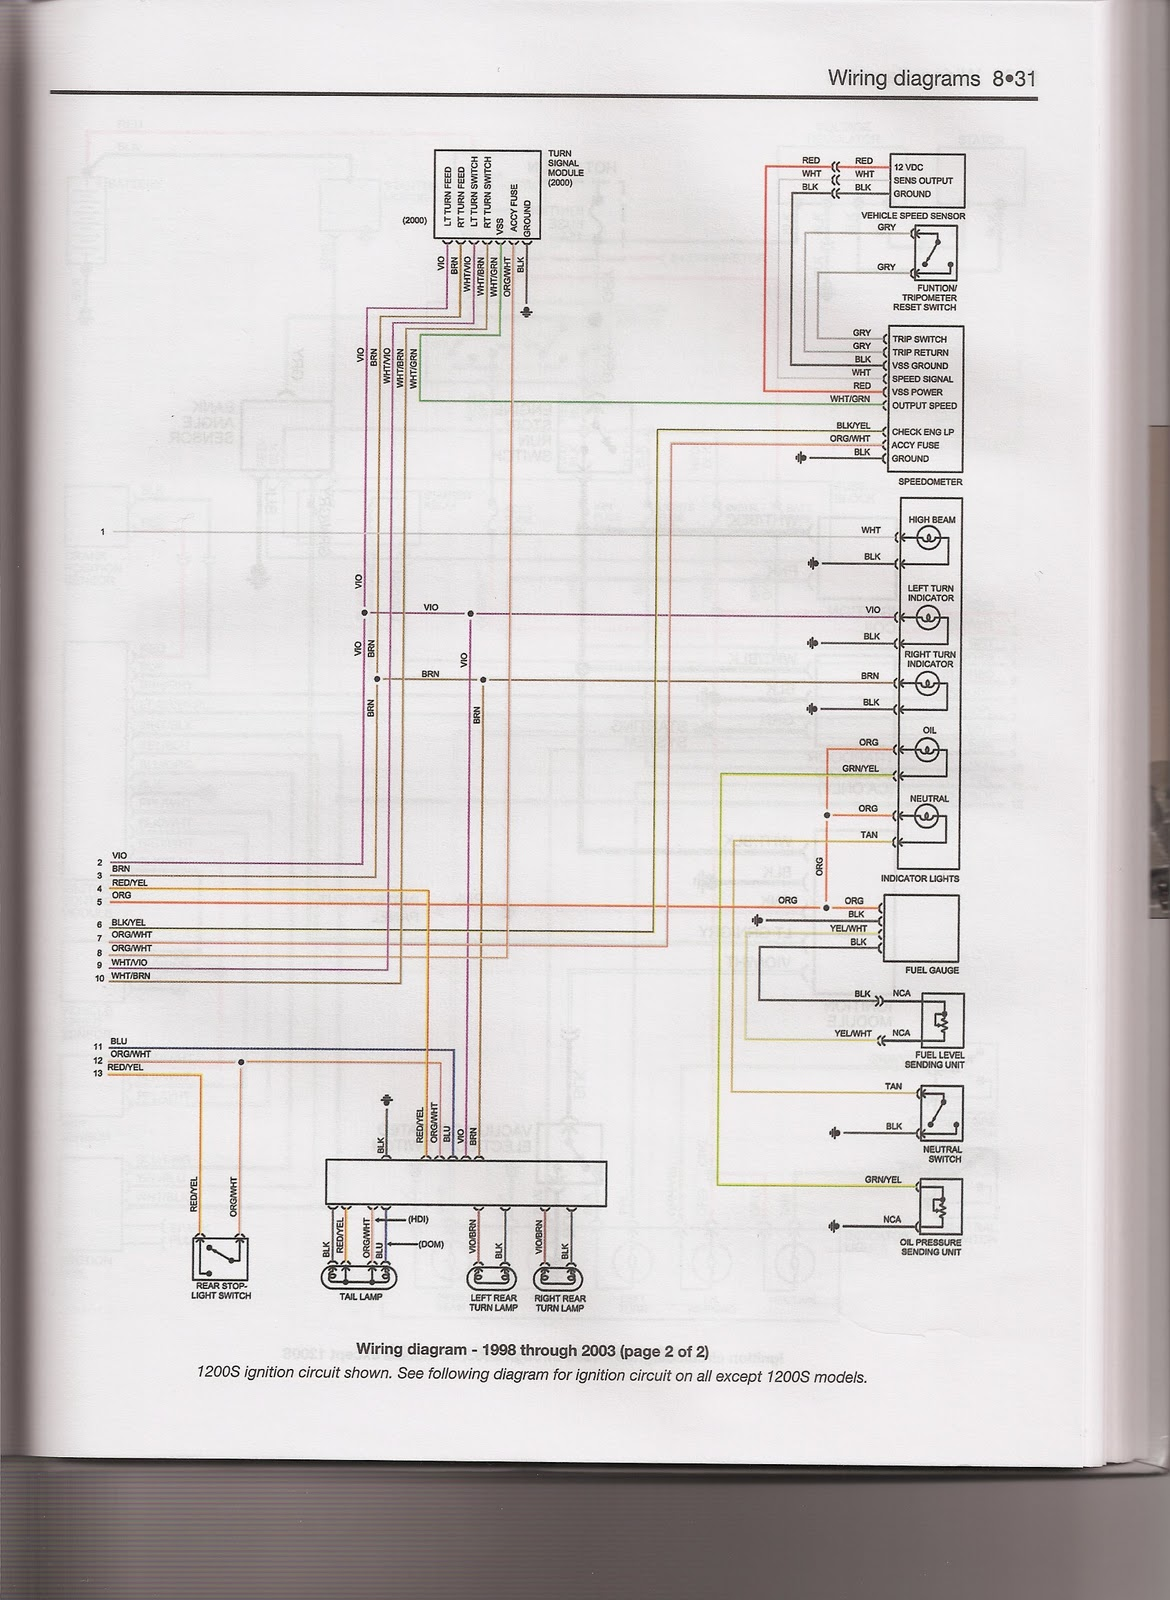 medium resolution of kracker jacks wiring diagrams for a 98 03 sportster rh krackerjacksc blogspot com 77 sportster wiring